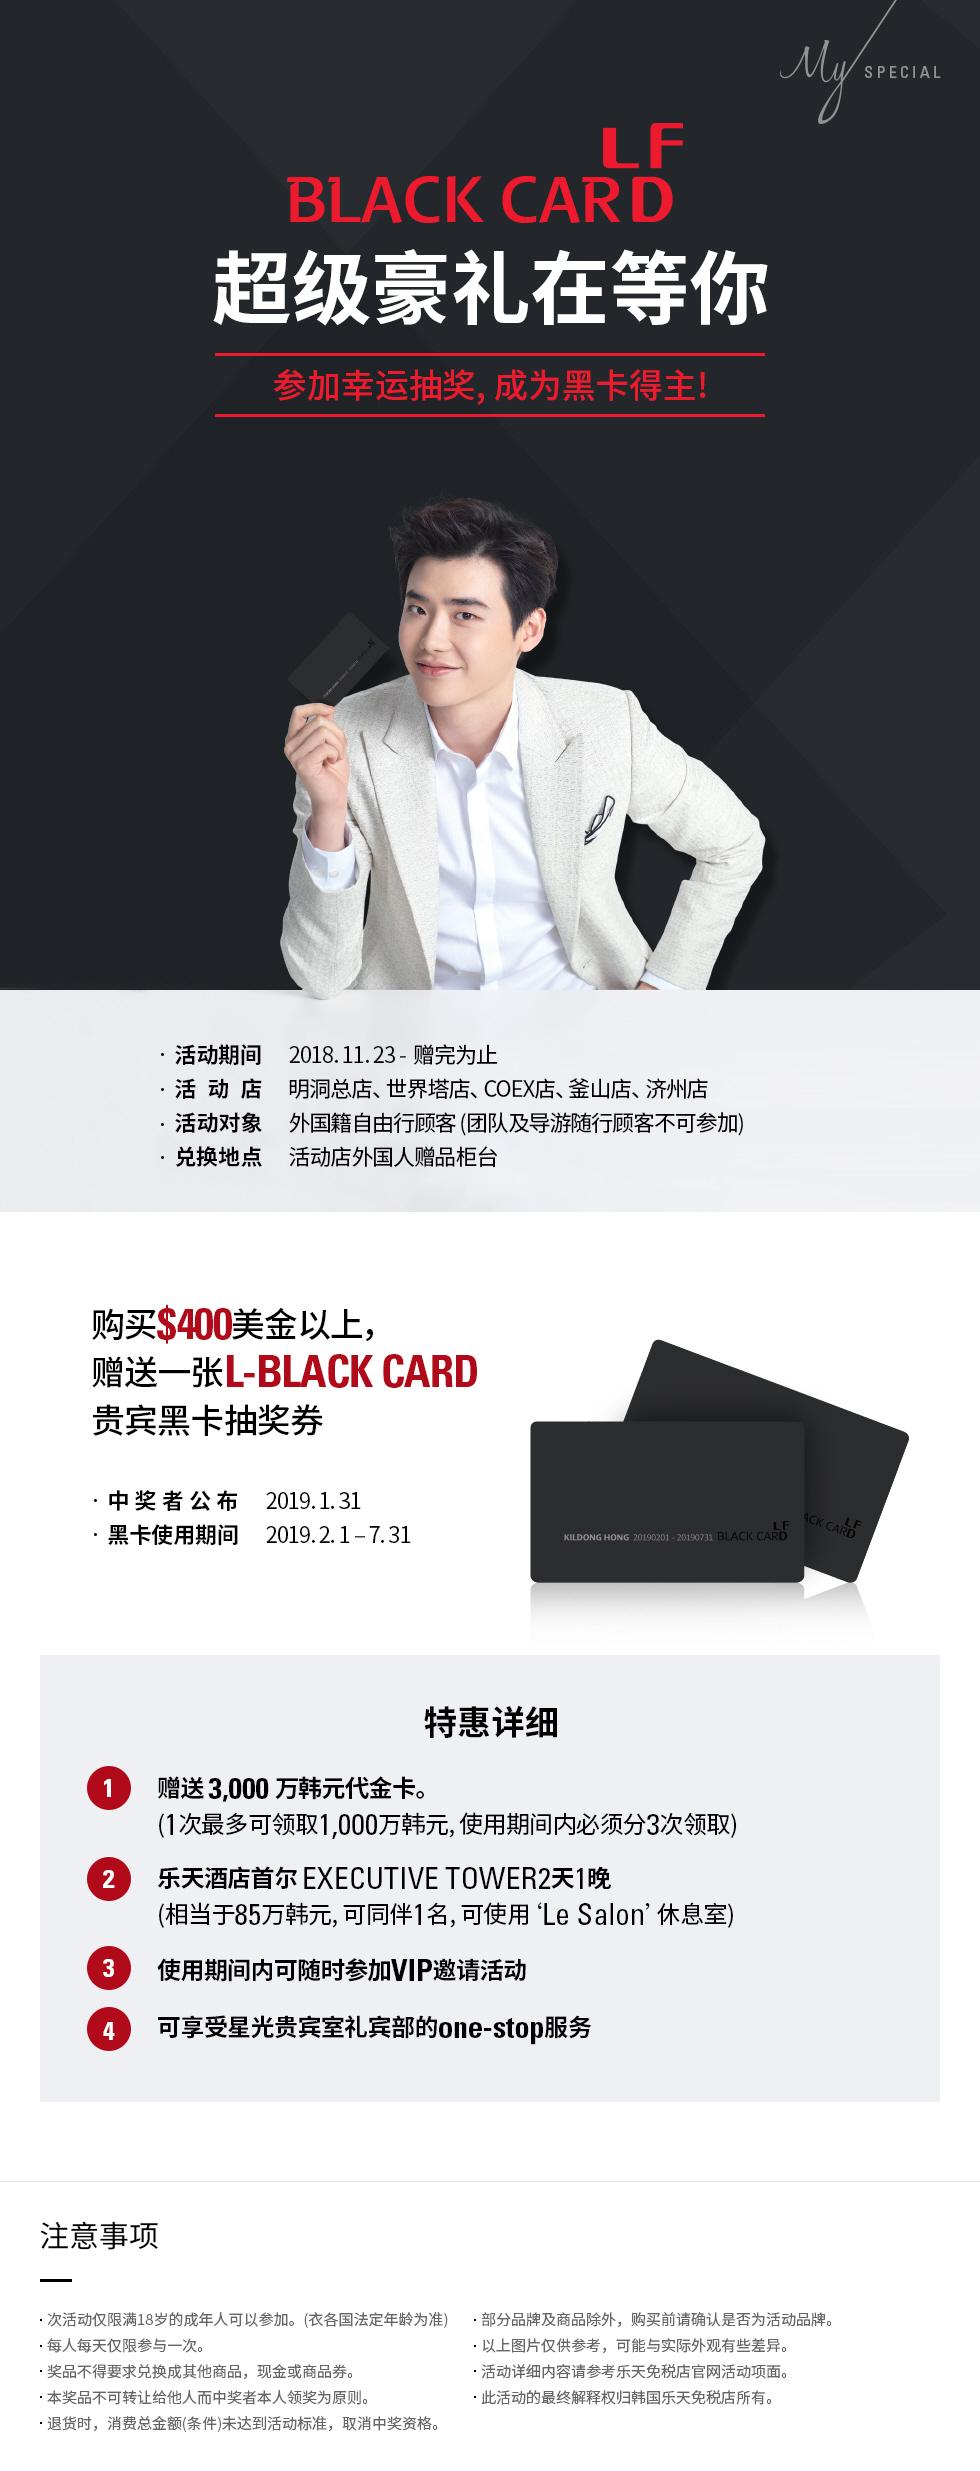 BLACK CARD 냠 超级豪礼在等你